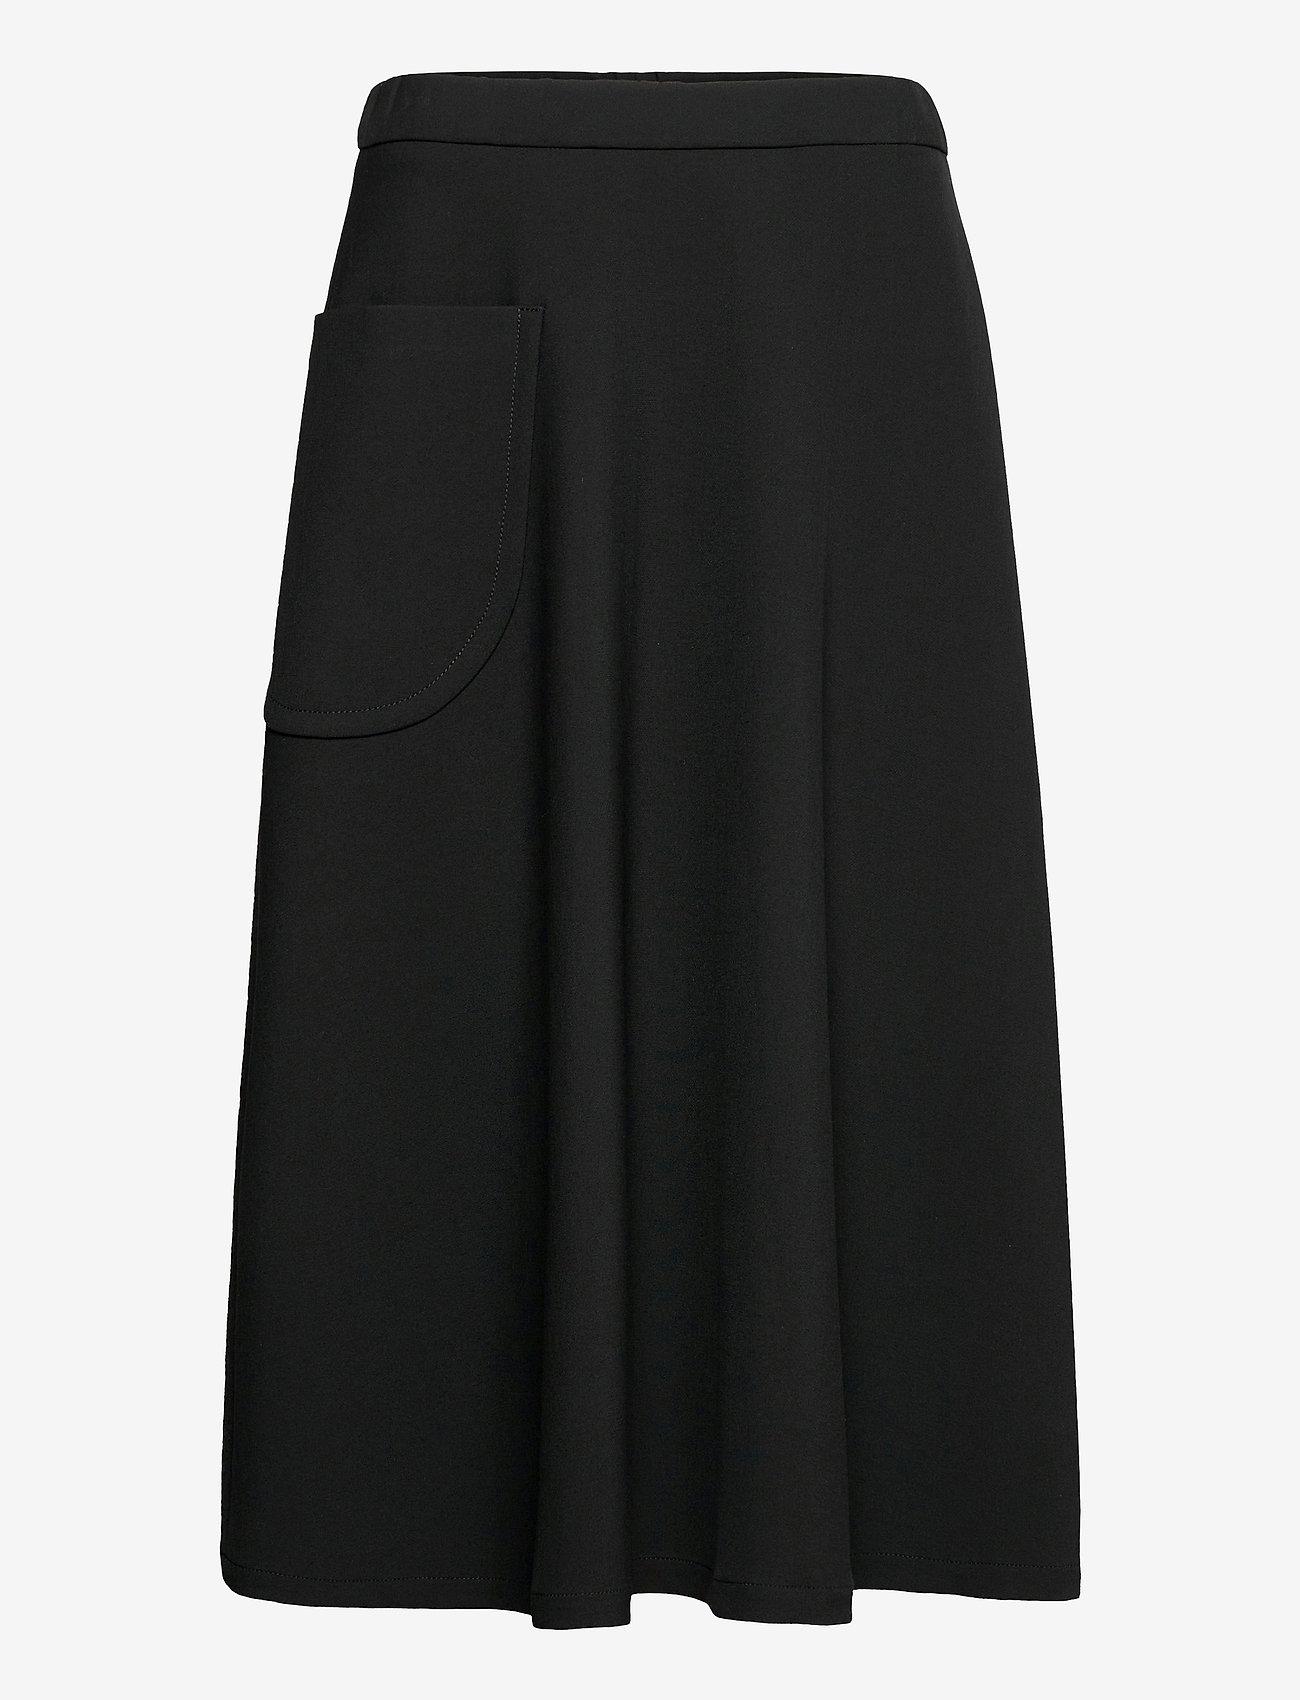 Marimekko - LOUHI SOLID SKIRT - midinederdele - black - 0